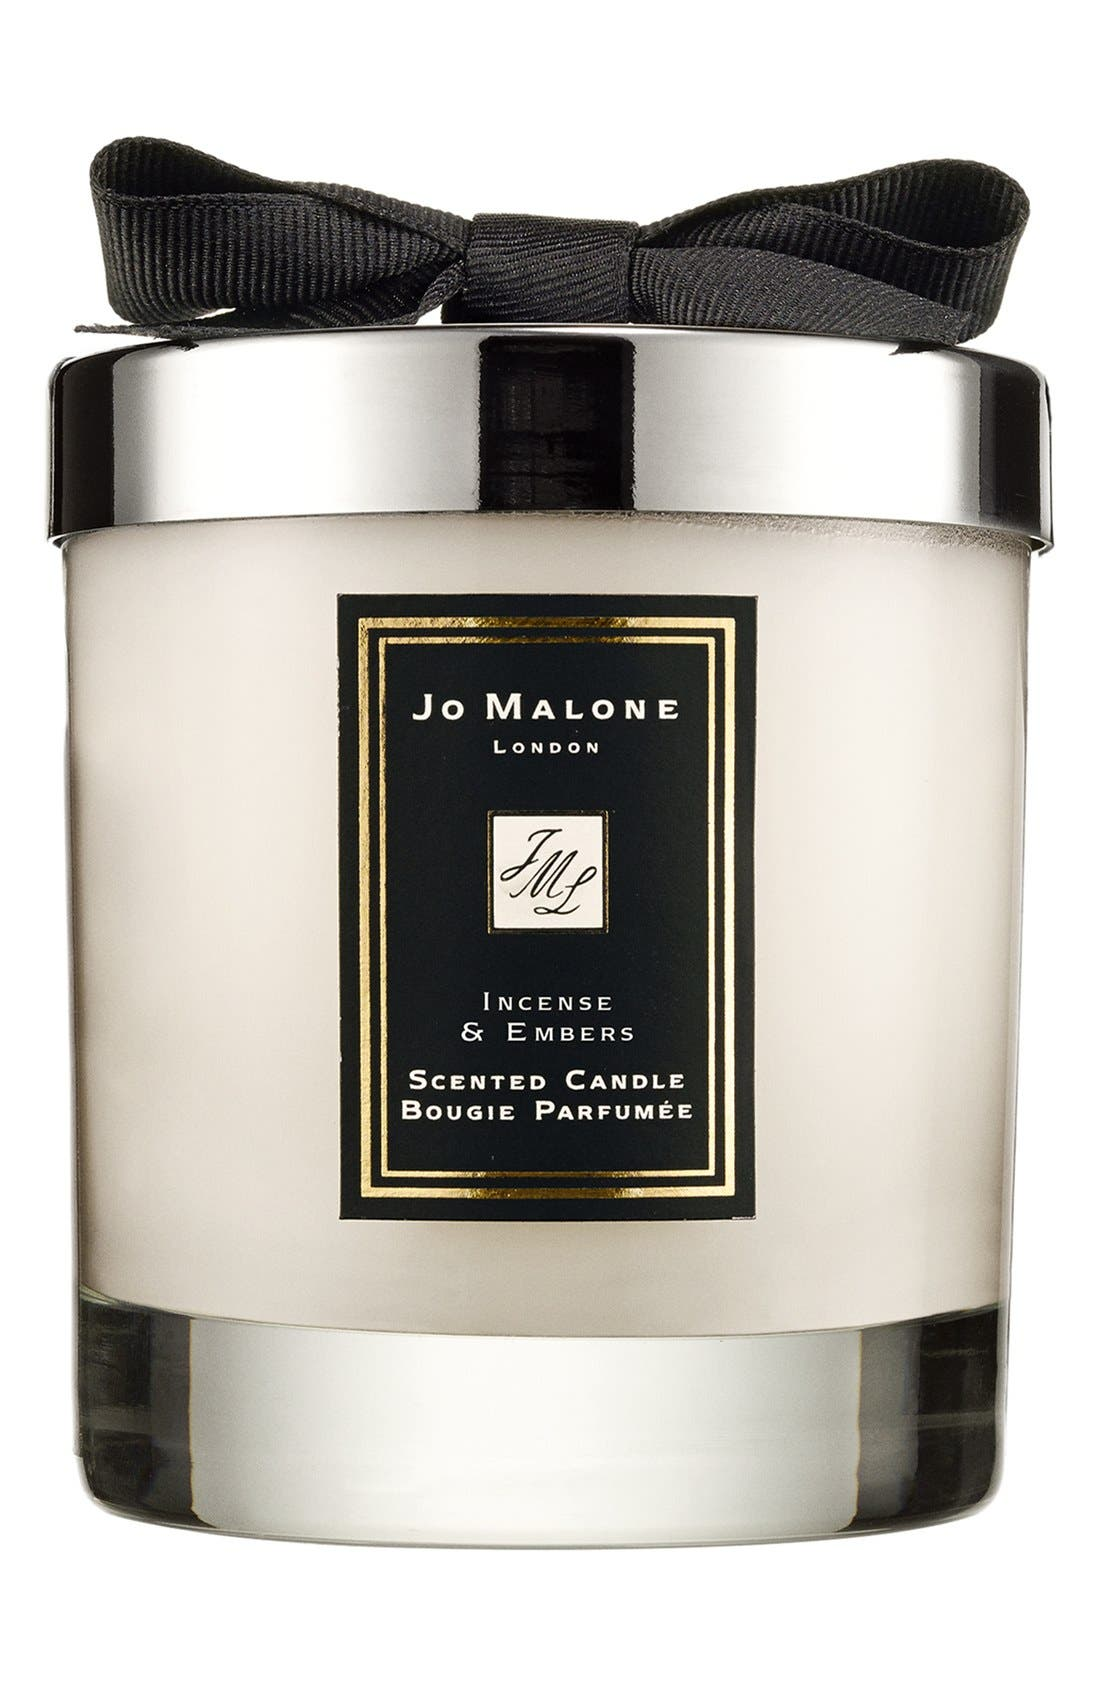 Jo Malone™ Just Like Sunday - Incense & Embers Candle